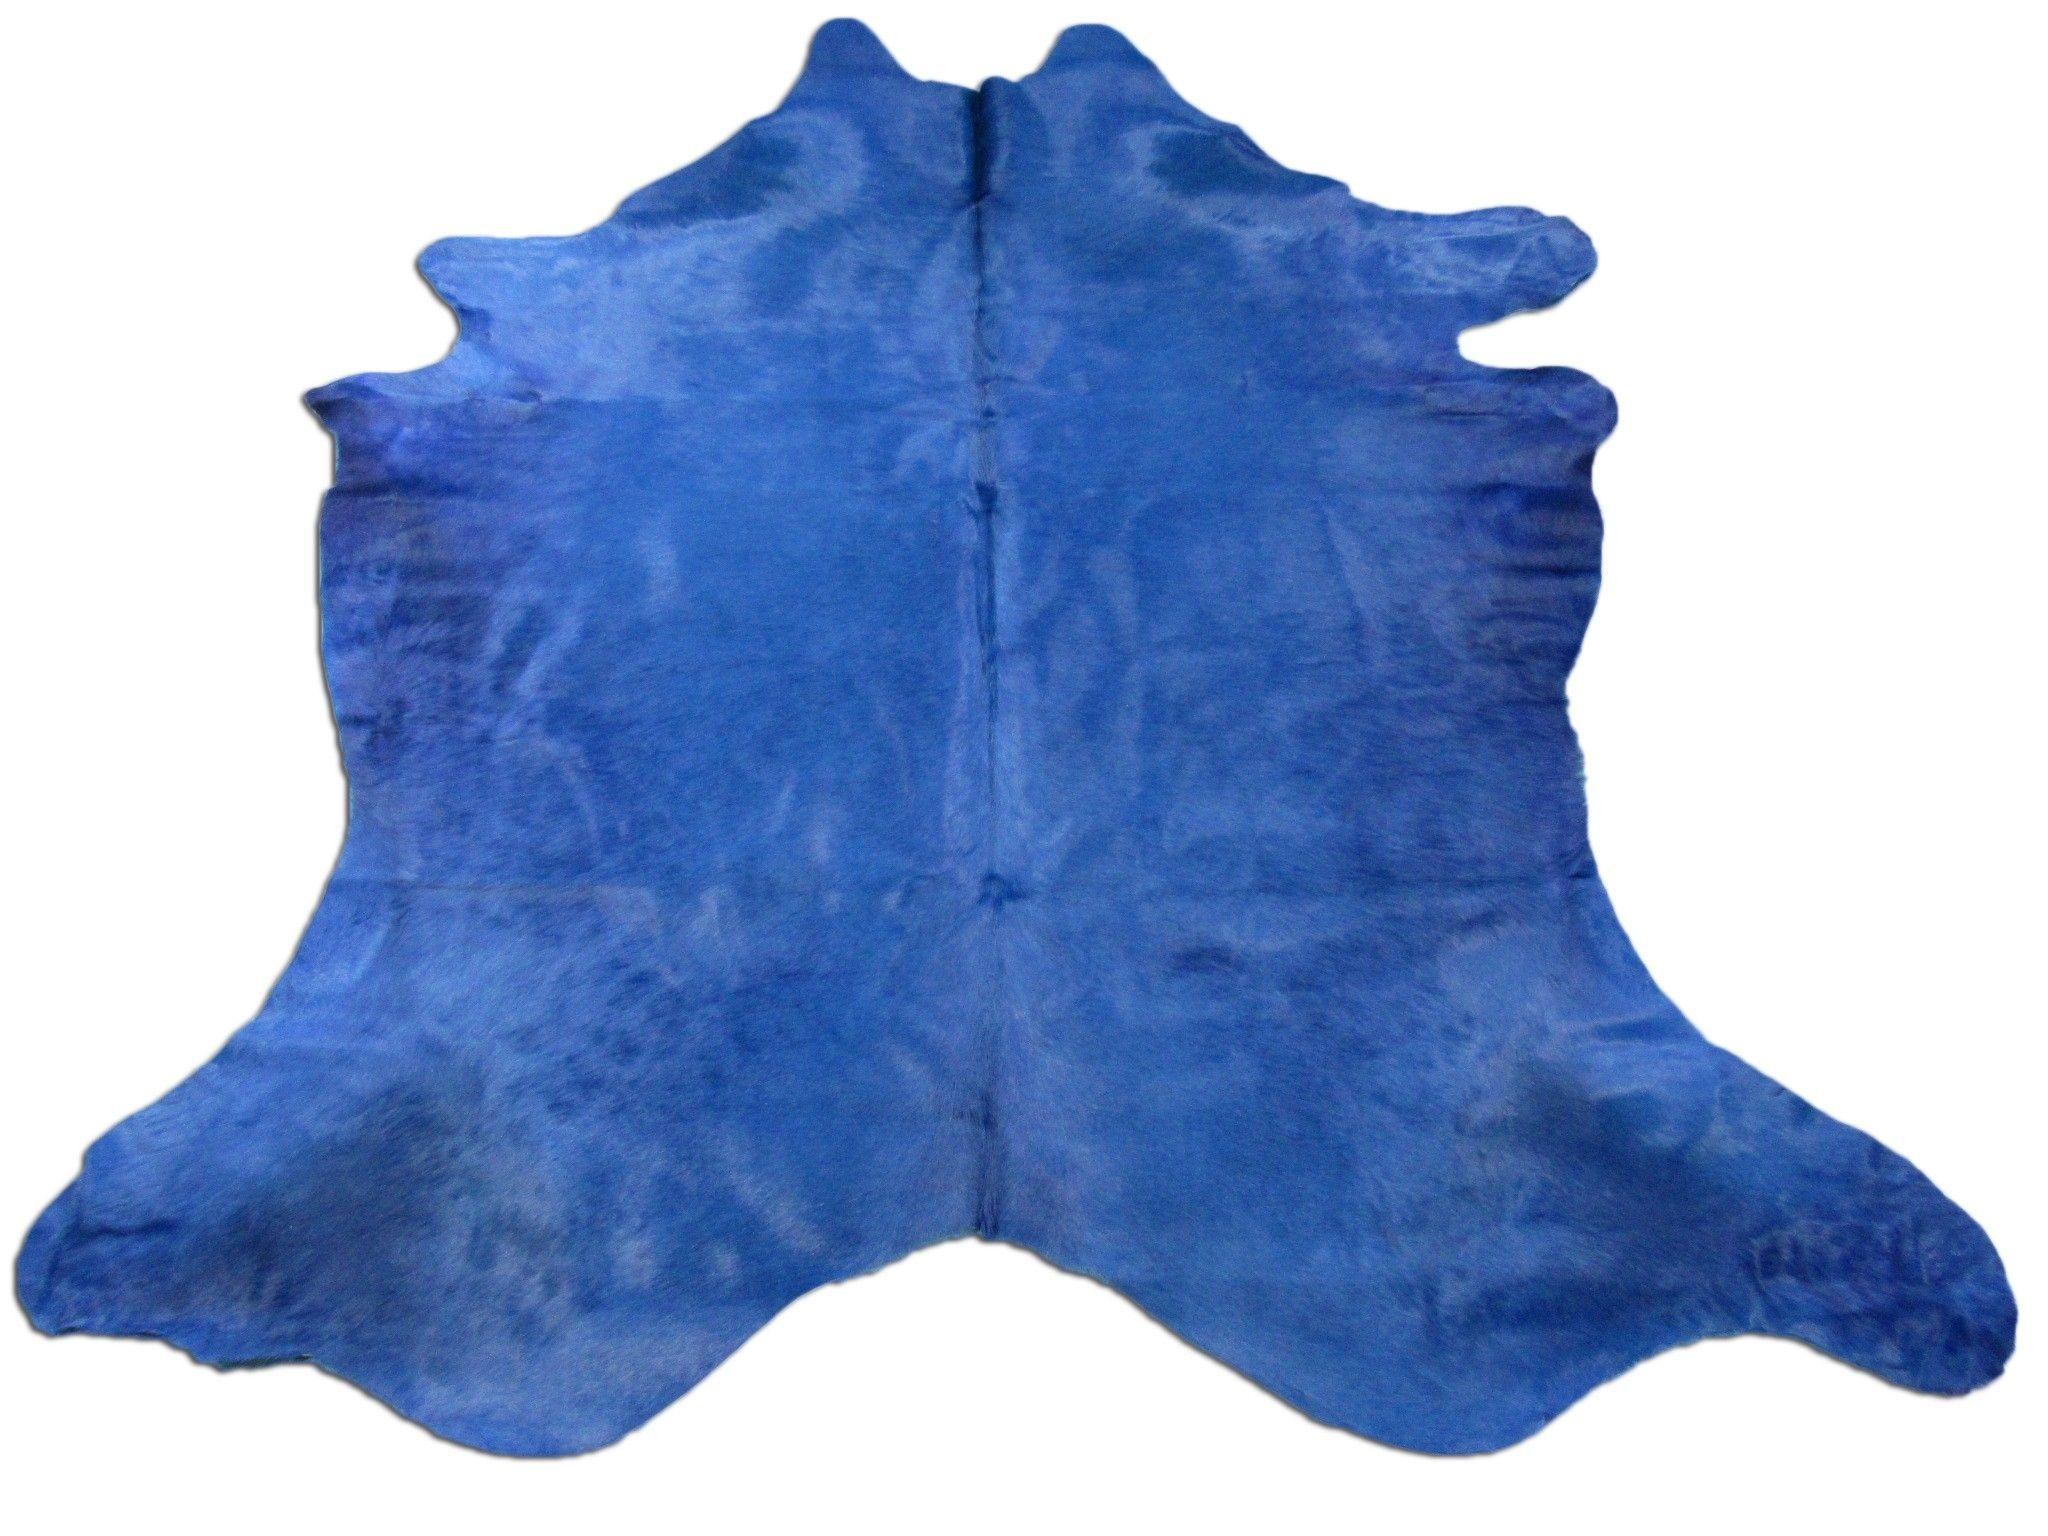 Dyed Royal Blue Cowhide Rug Size 8 X 7 5 Huge Royal Blue